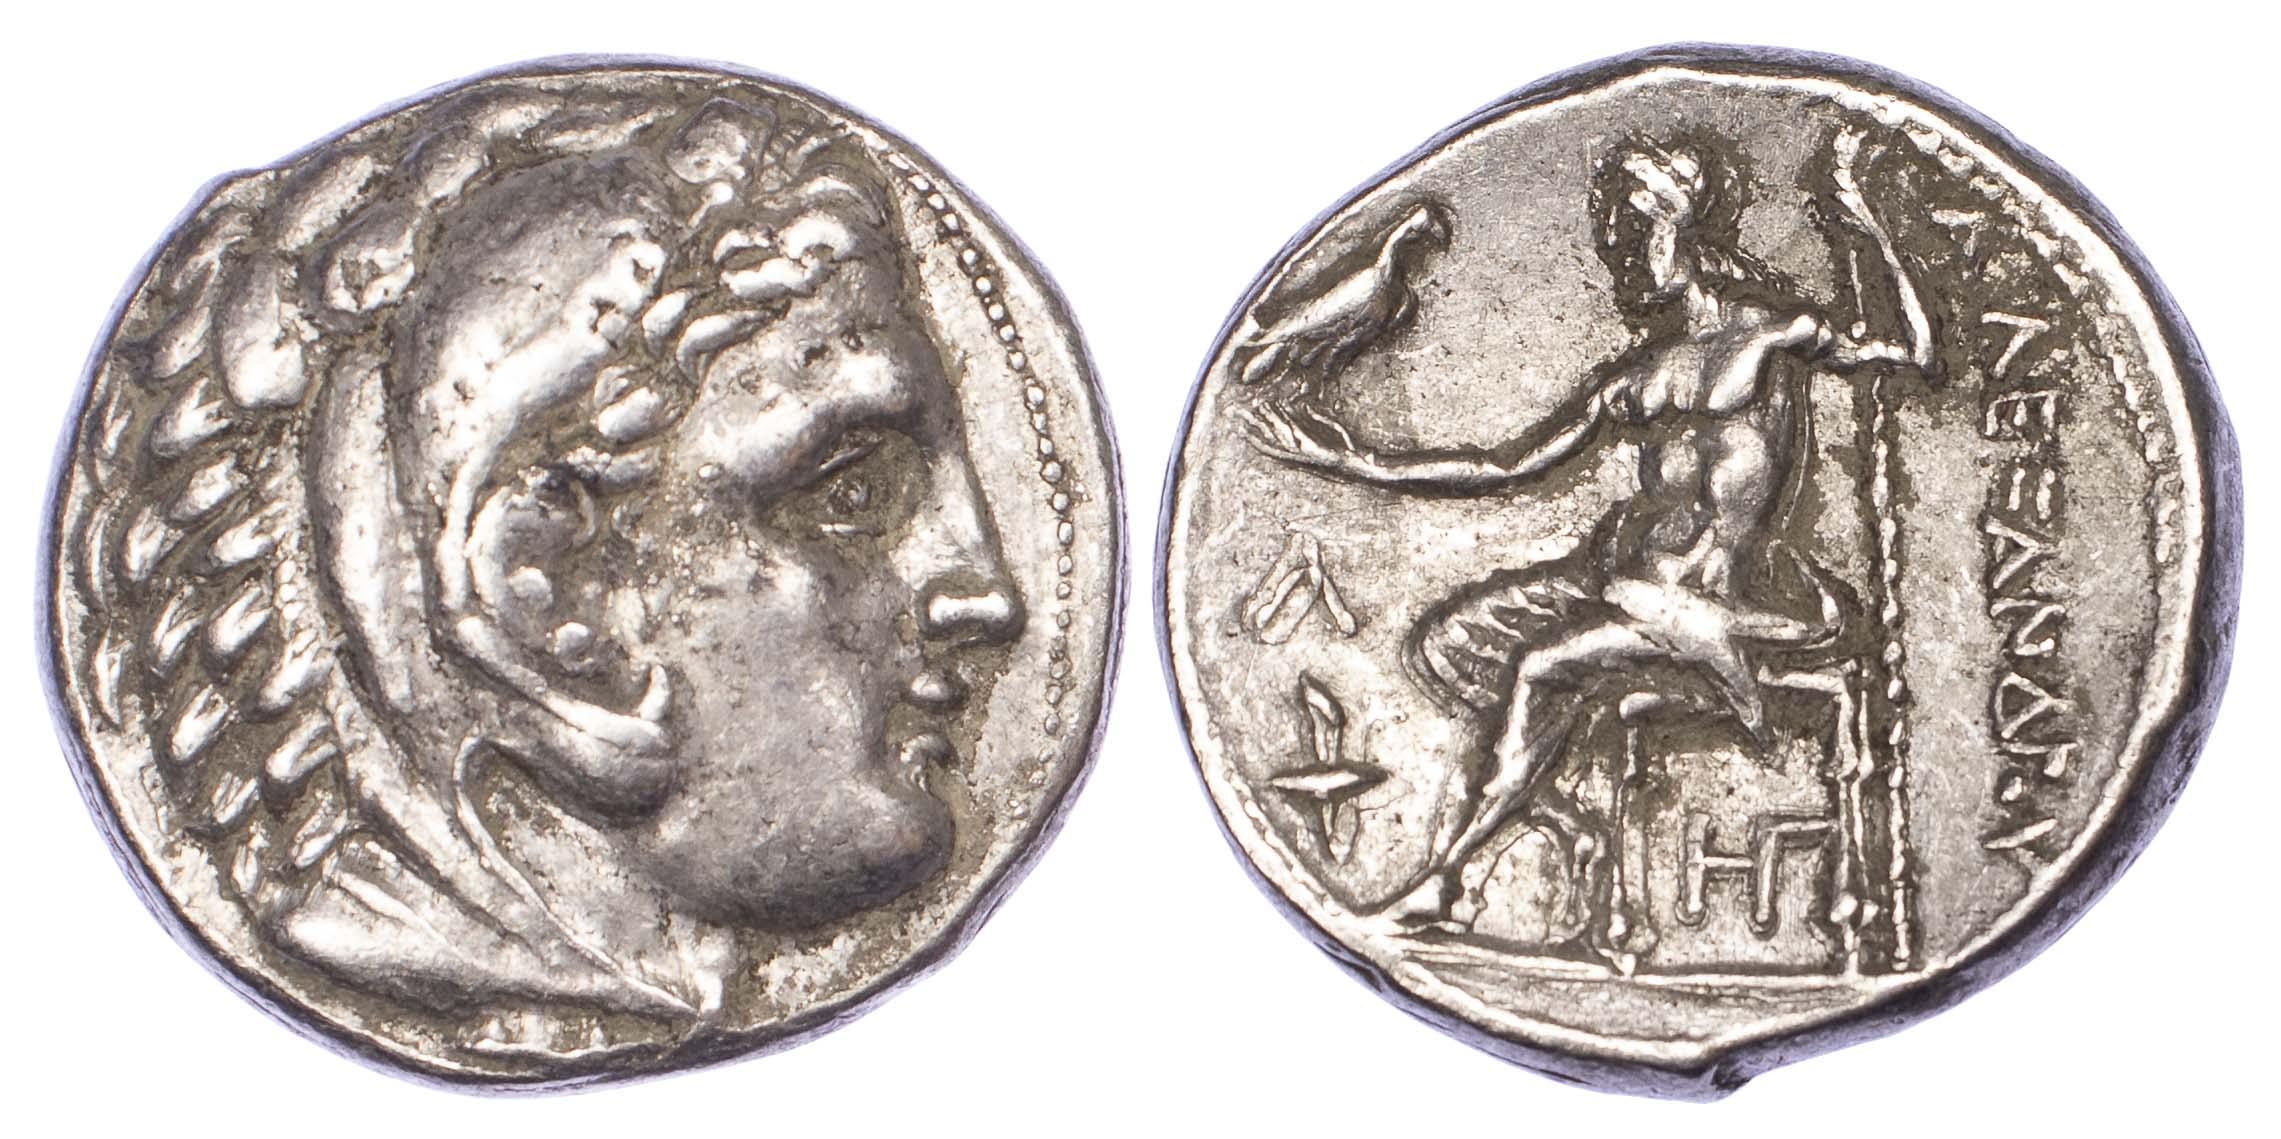 Kingdom of Macedon, Alexander the Great, Silver Tetradrachm